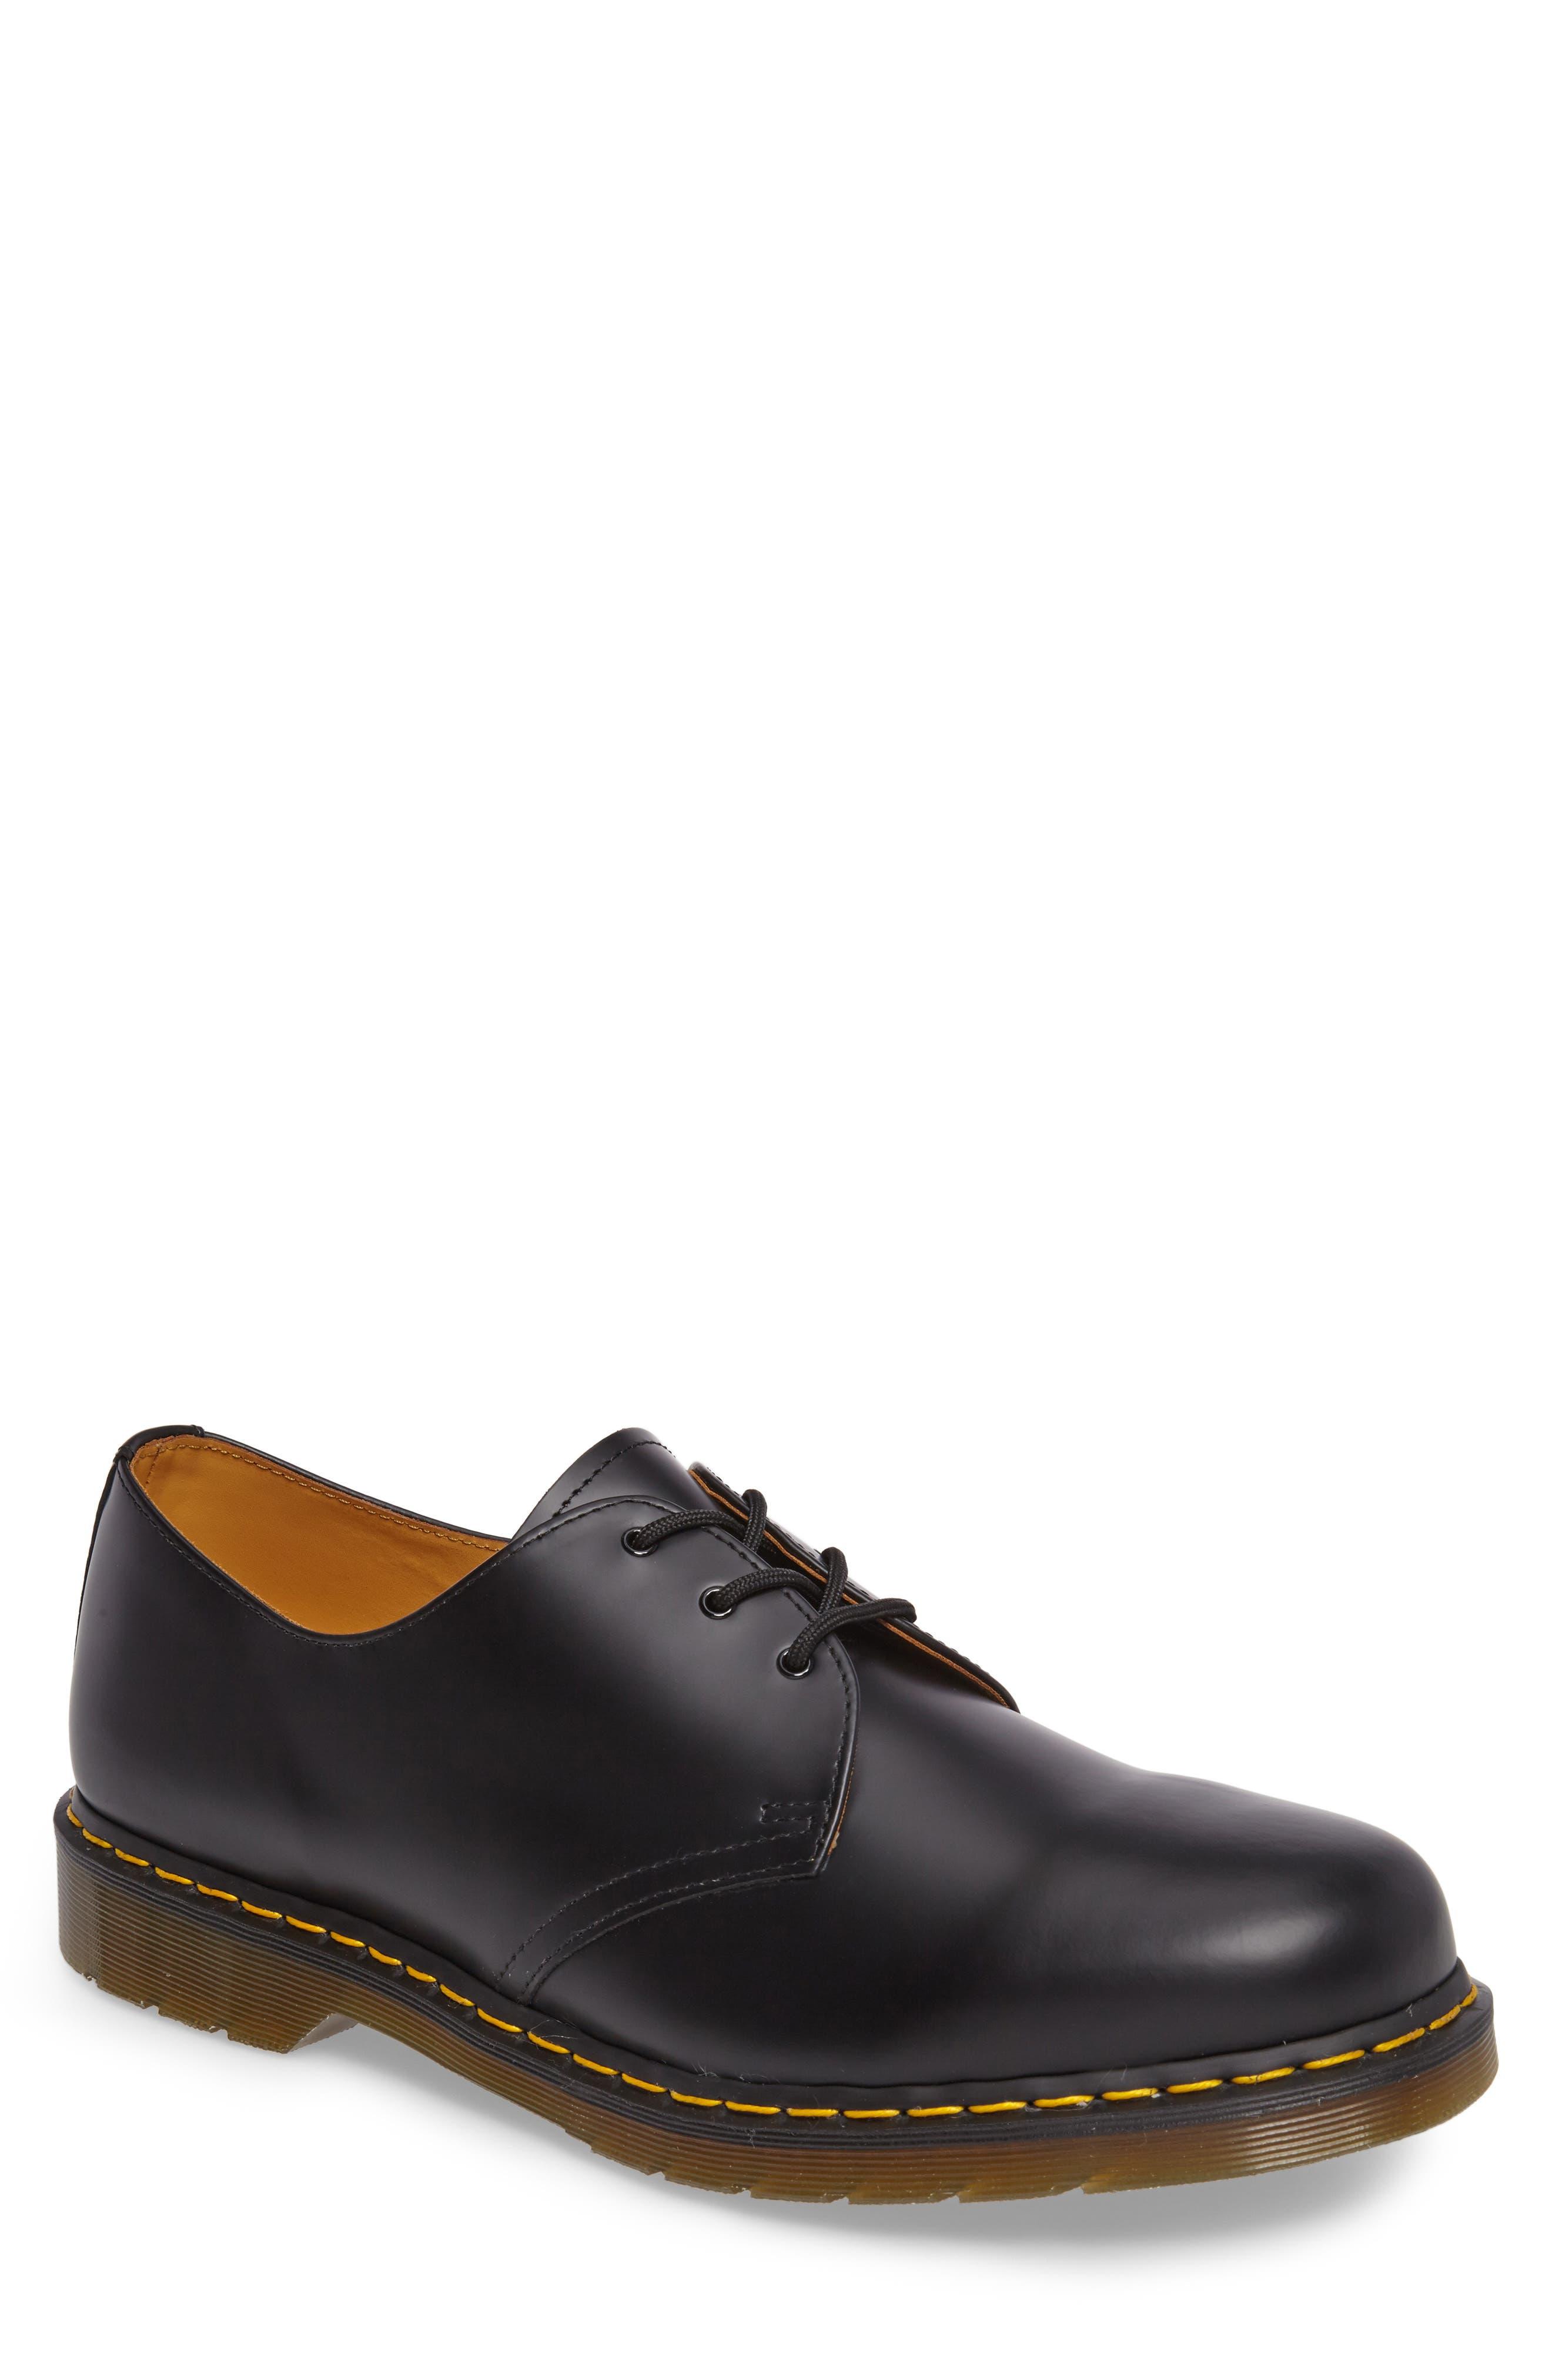 DR. MARTENS Plain Toe Derby, Main, color, BLACK SMOOTH